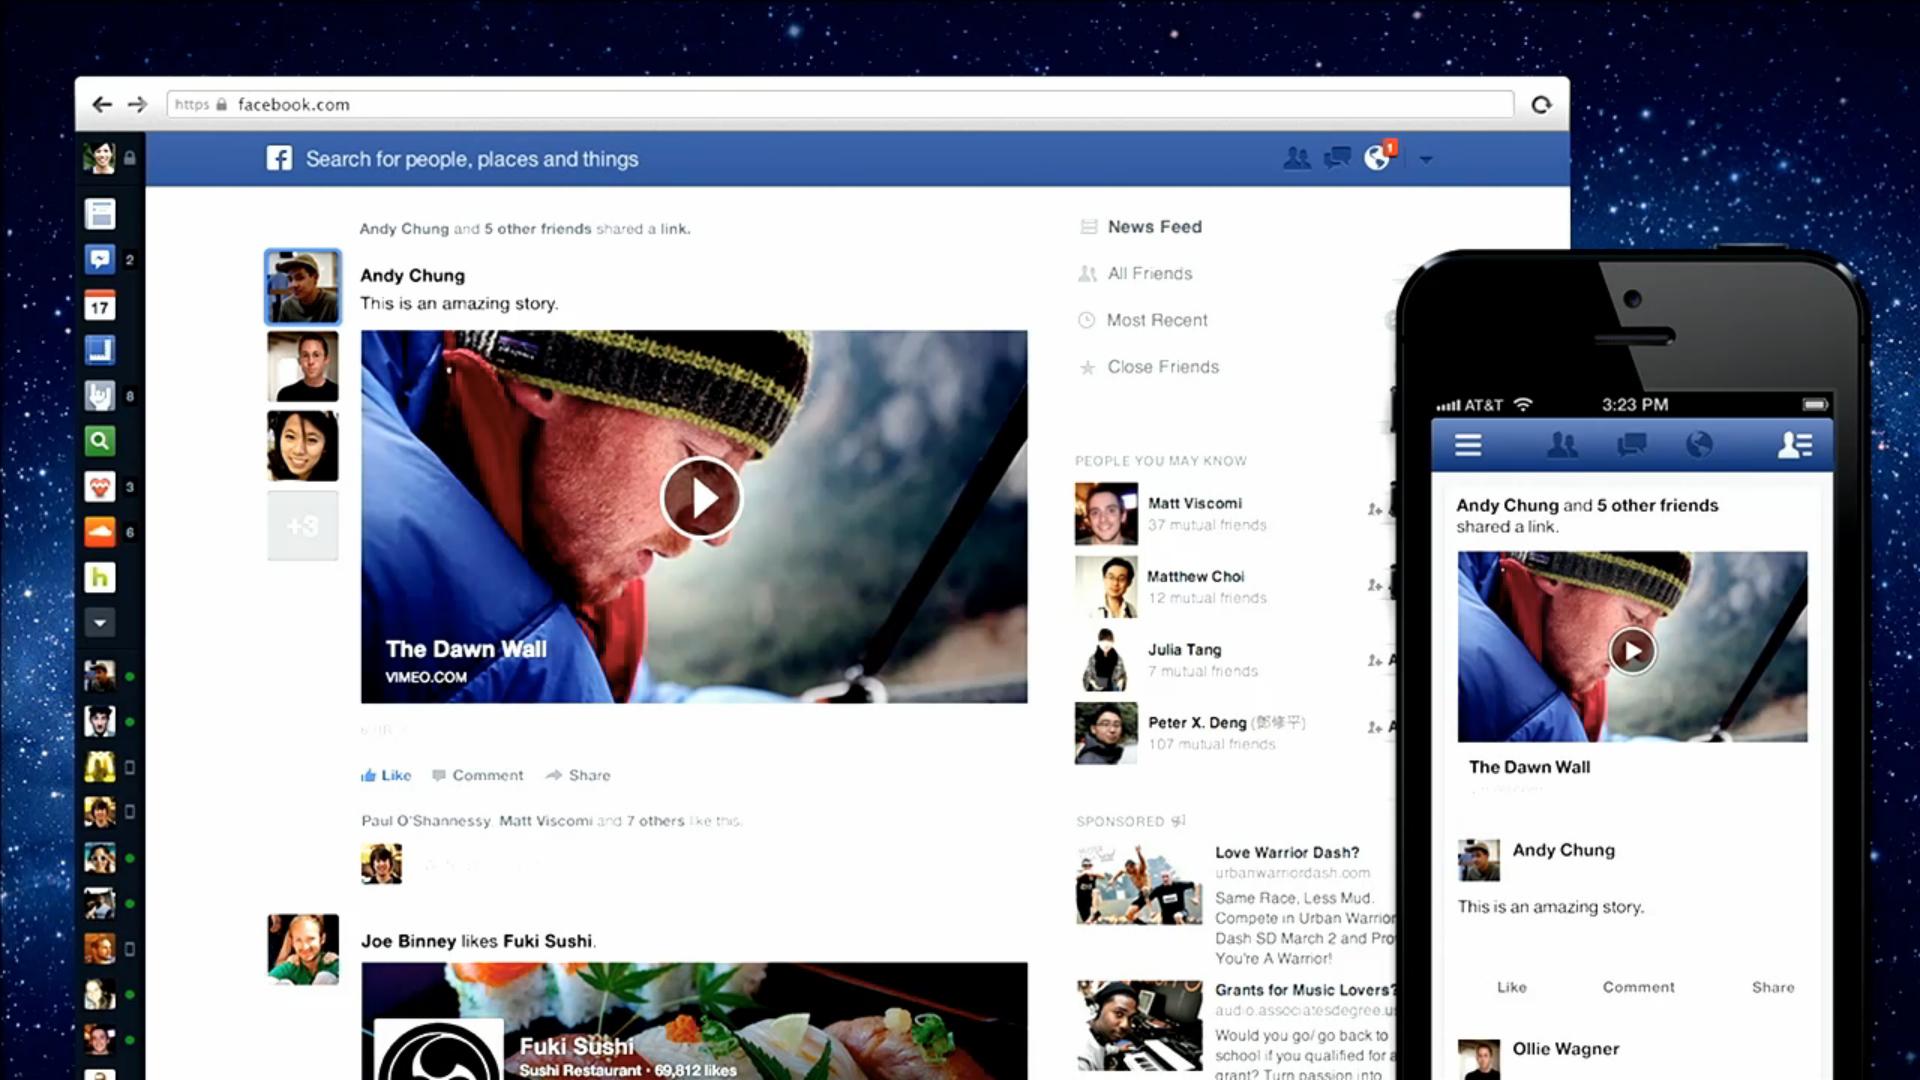 First look: New Facebook News Feed | TechRadar